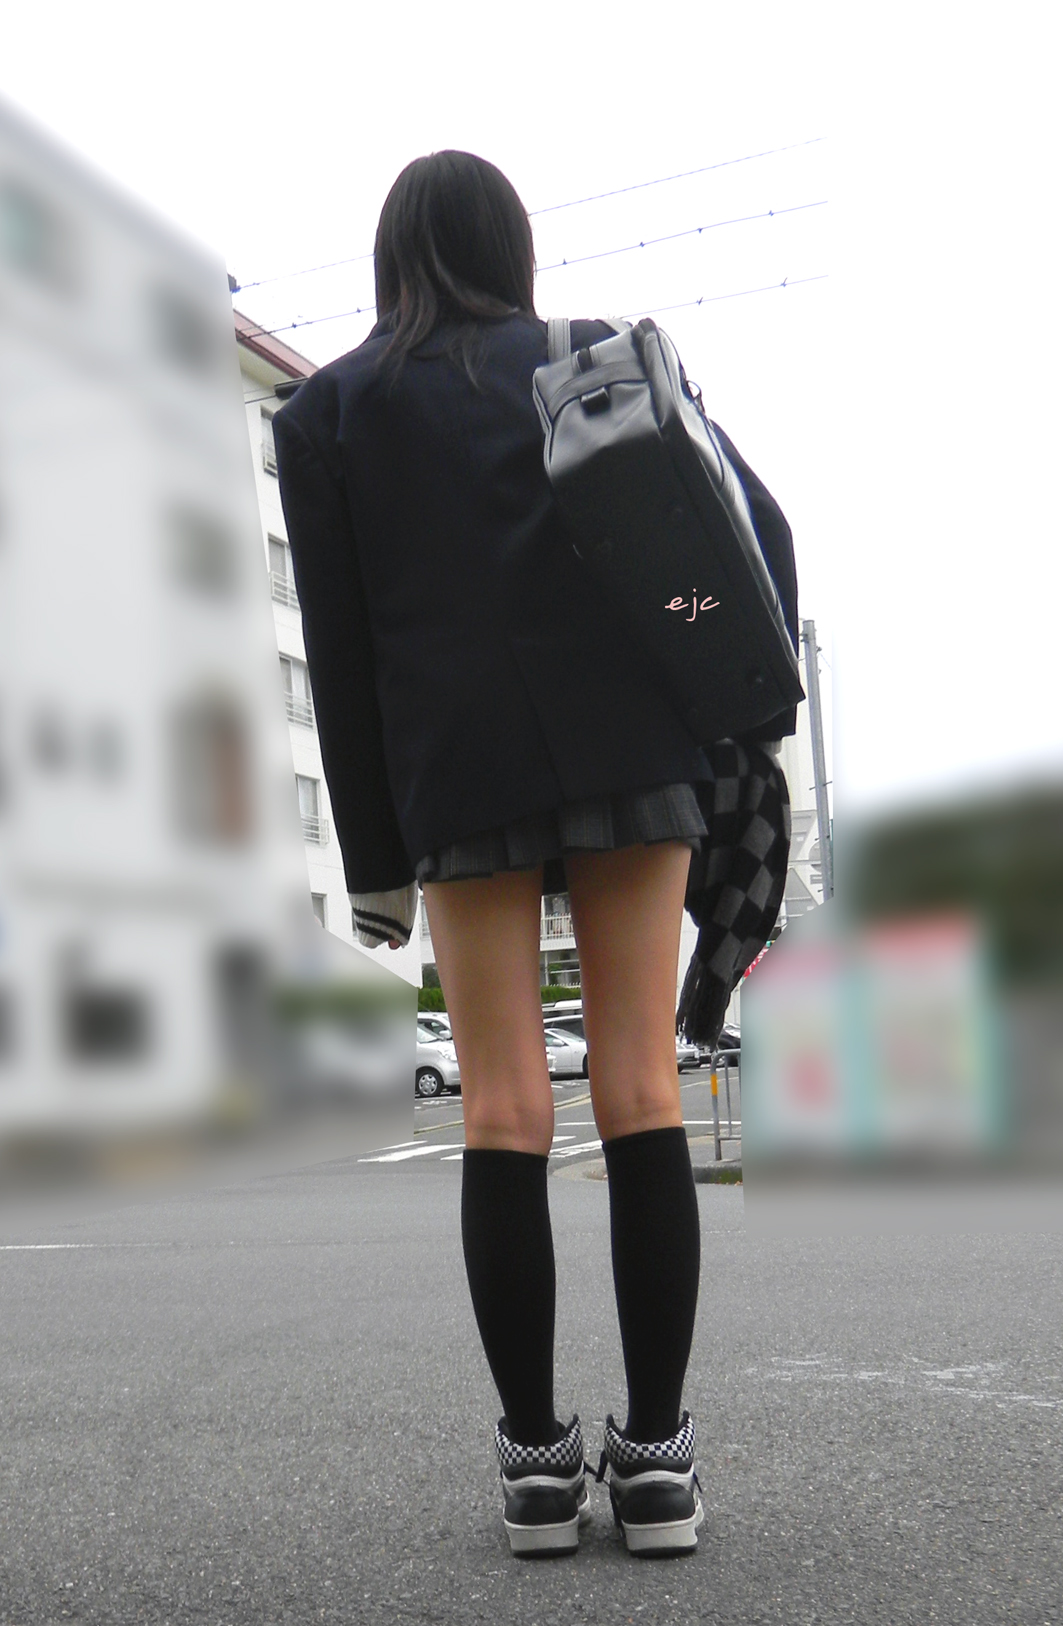 【JK街撮り】ムッチリとはまた違う色香wwwポ○キーみたいな細脚のJKたち 03